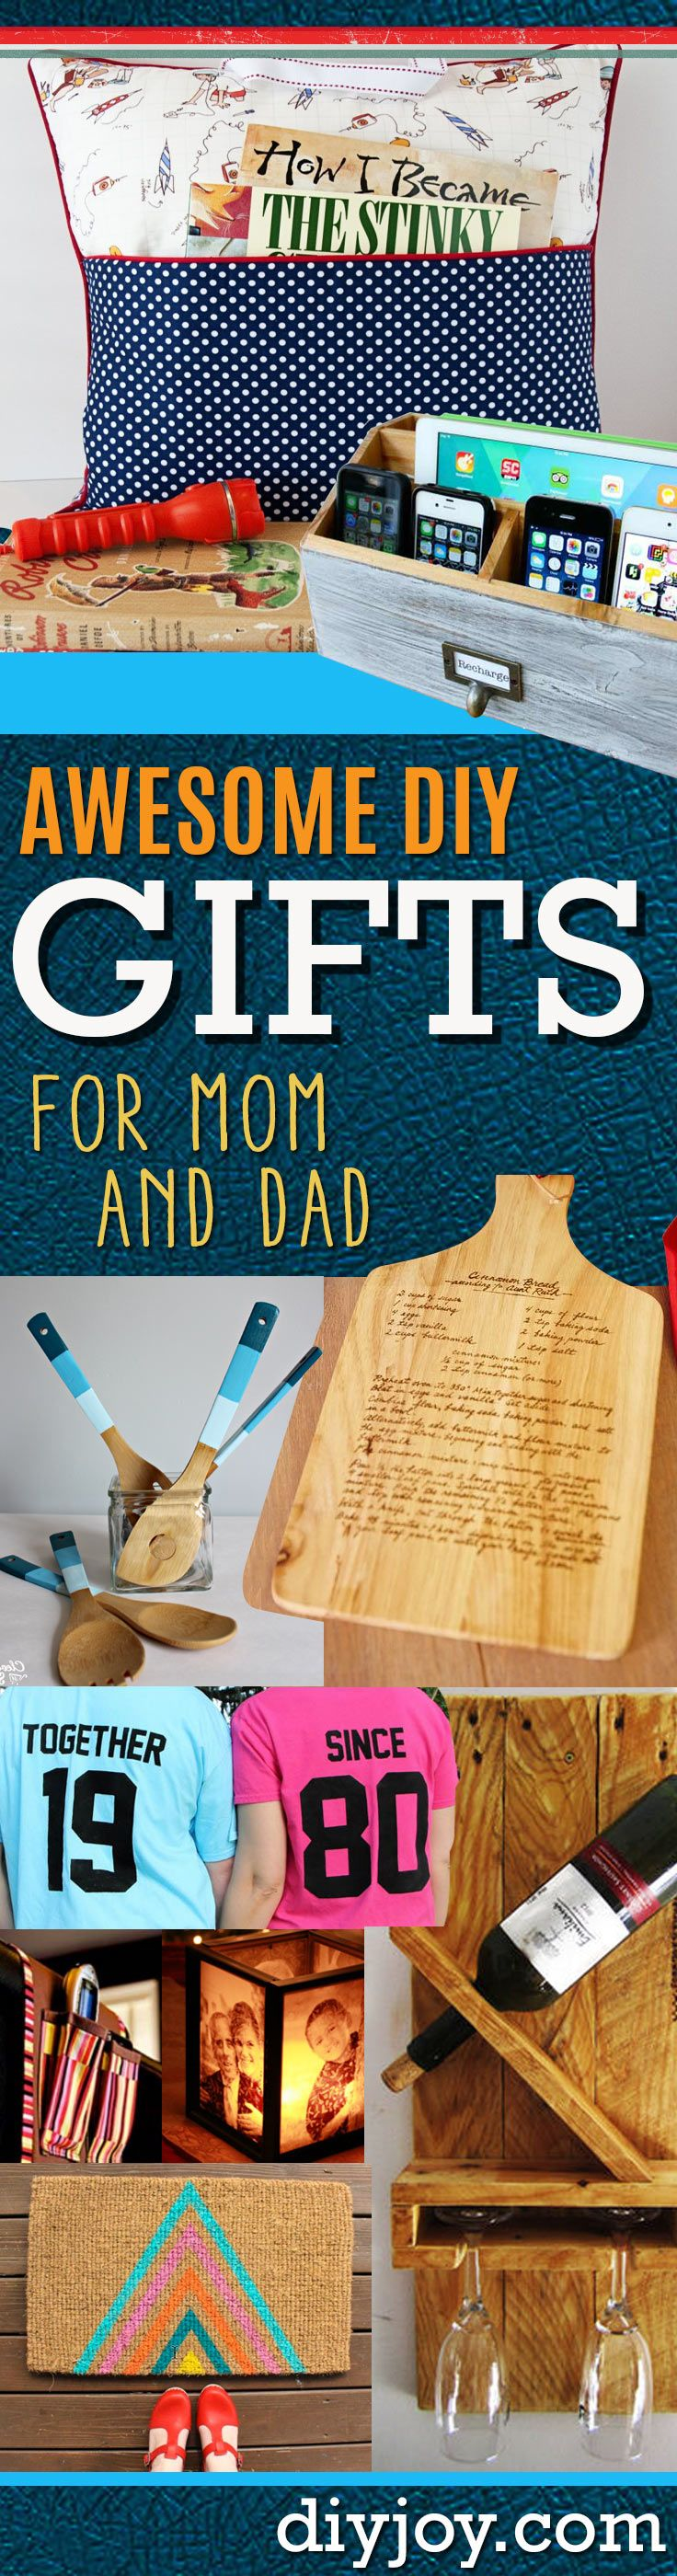 Awesome Homemade Christmas Gift Ideas | Giftsite.co